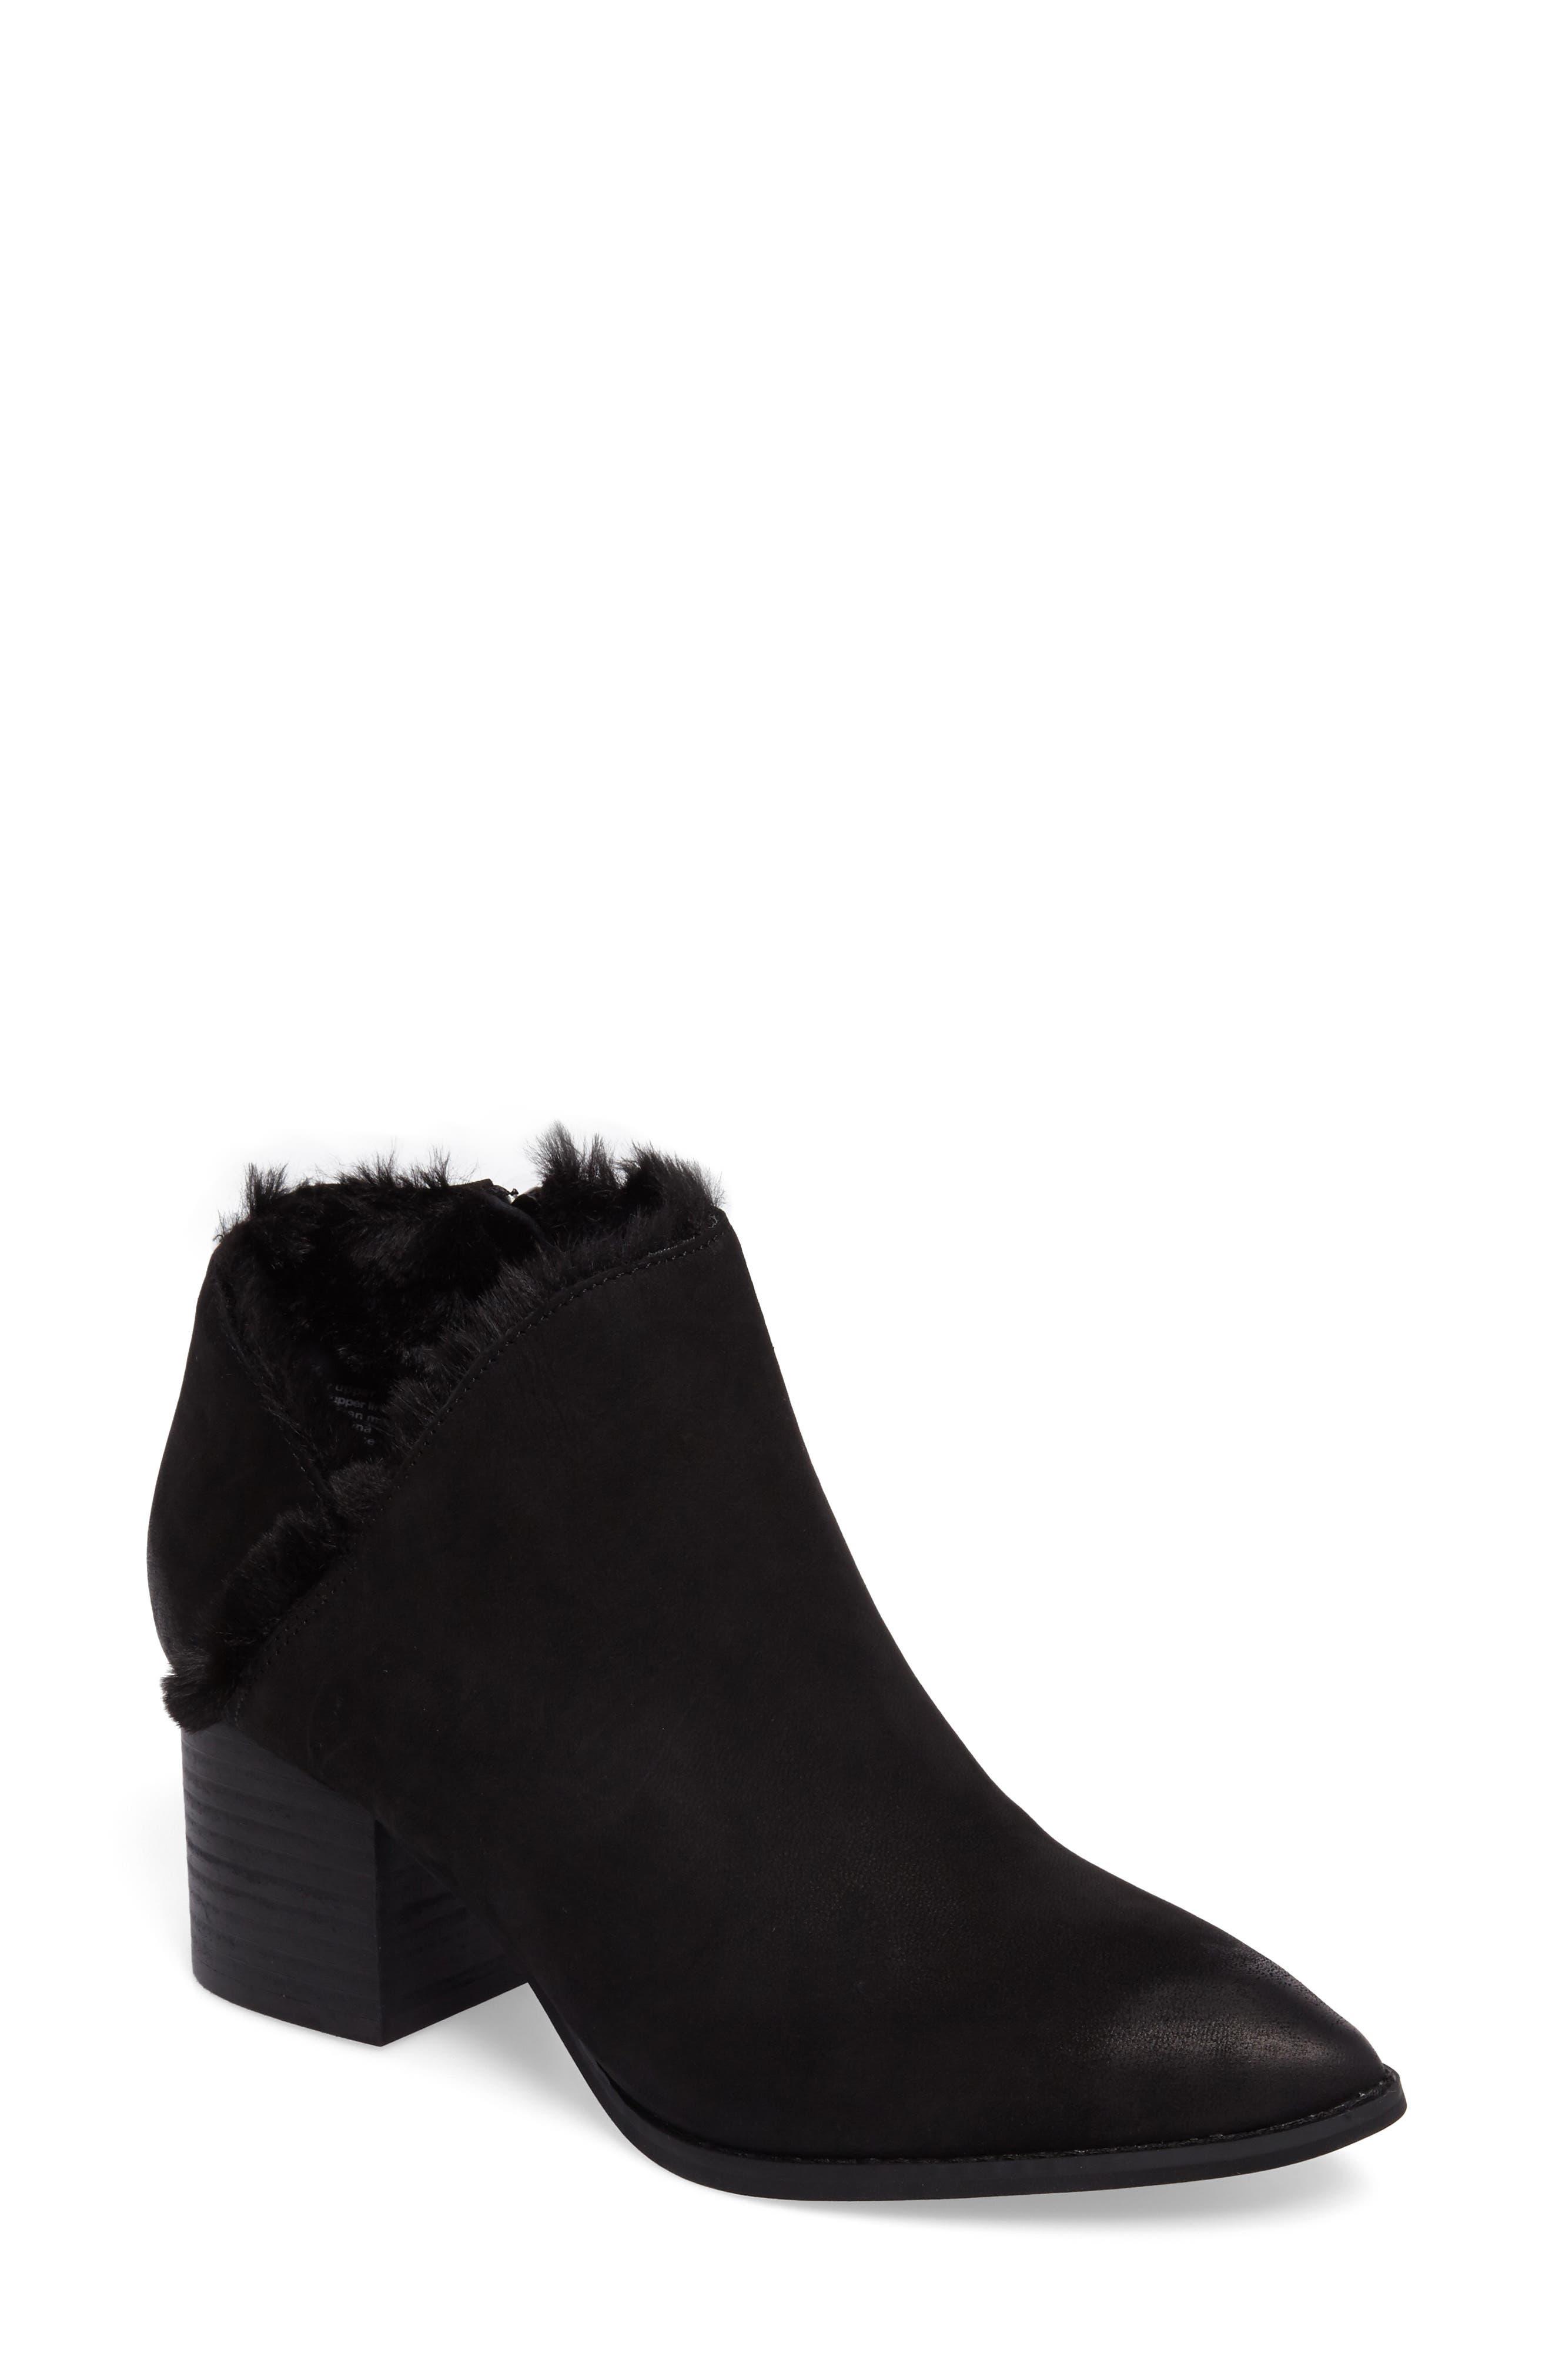 Preview Faux Fur Lined Bootie,                             Main thumbnail 1, color,                             Black Leather